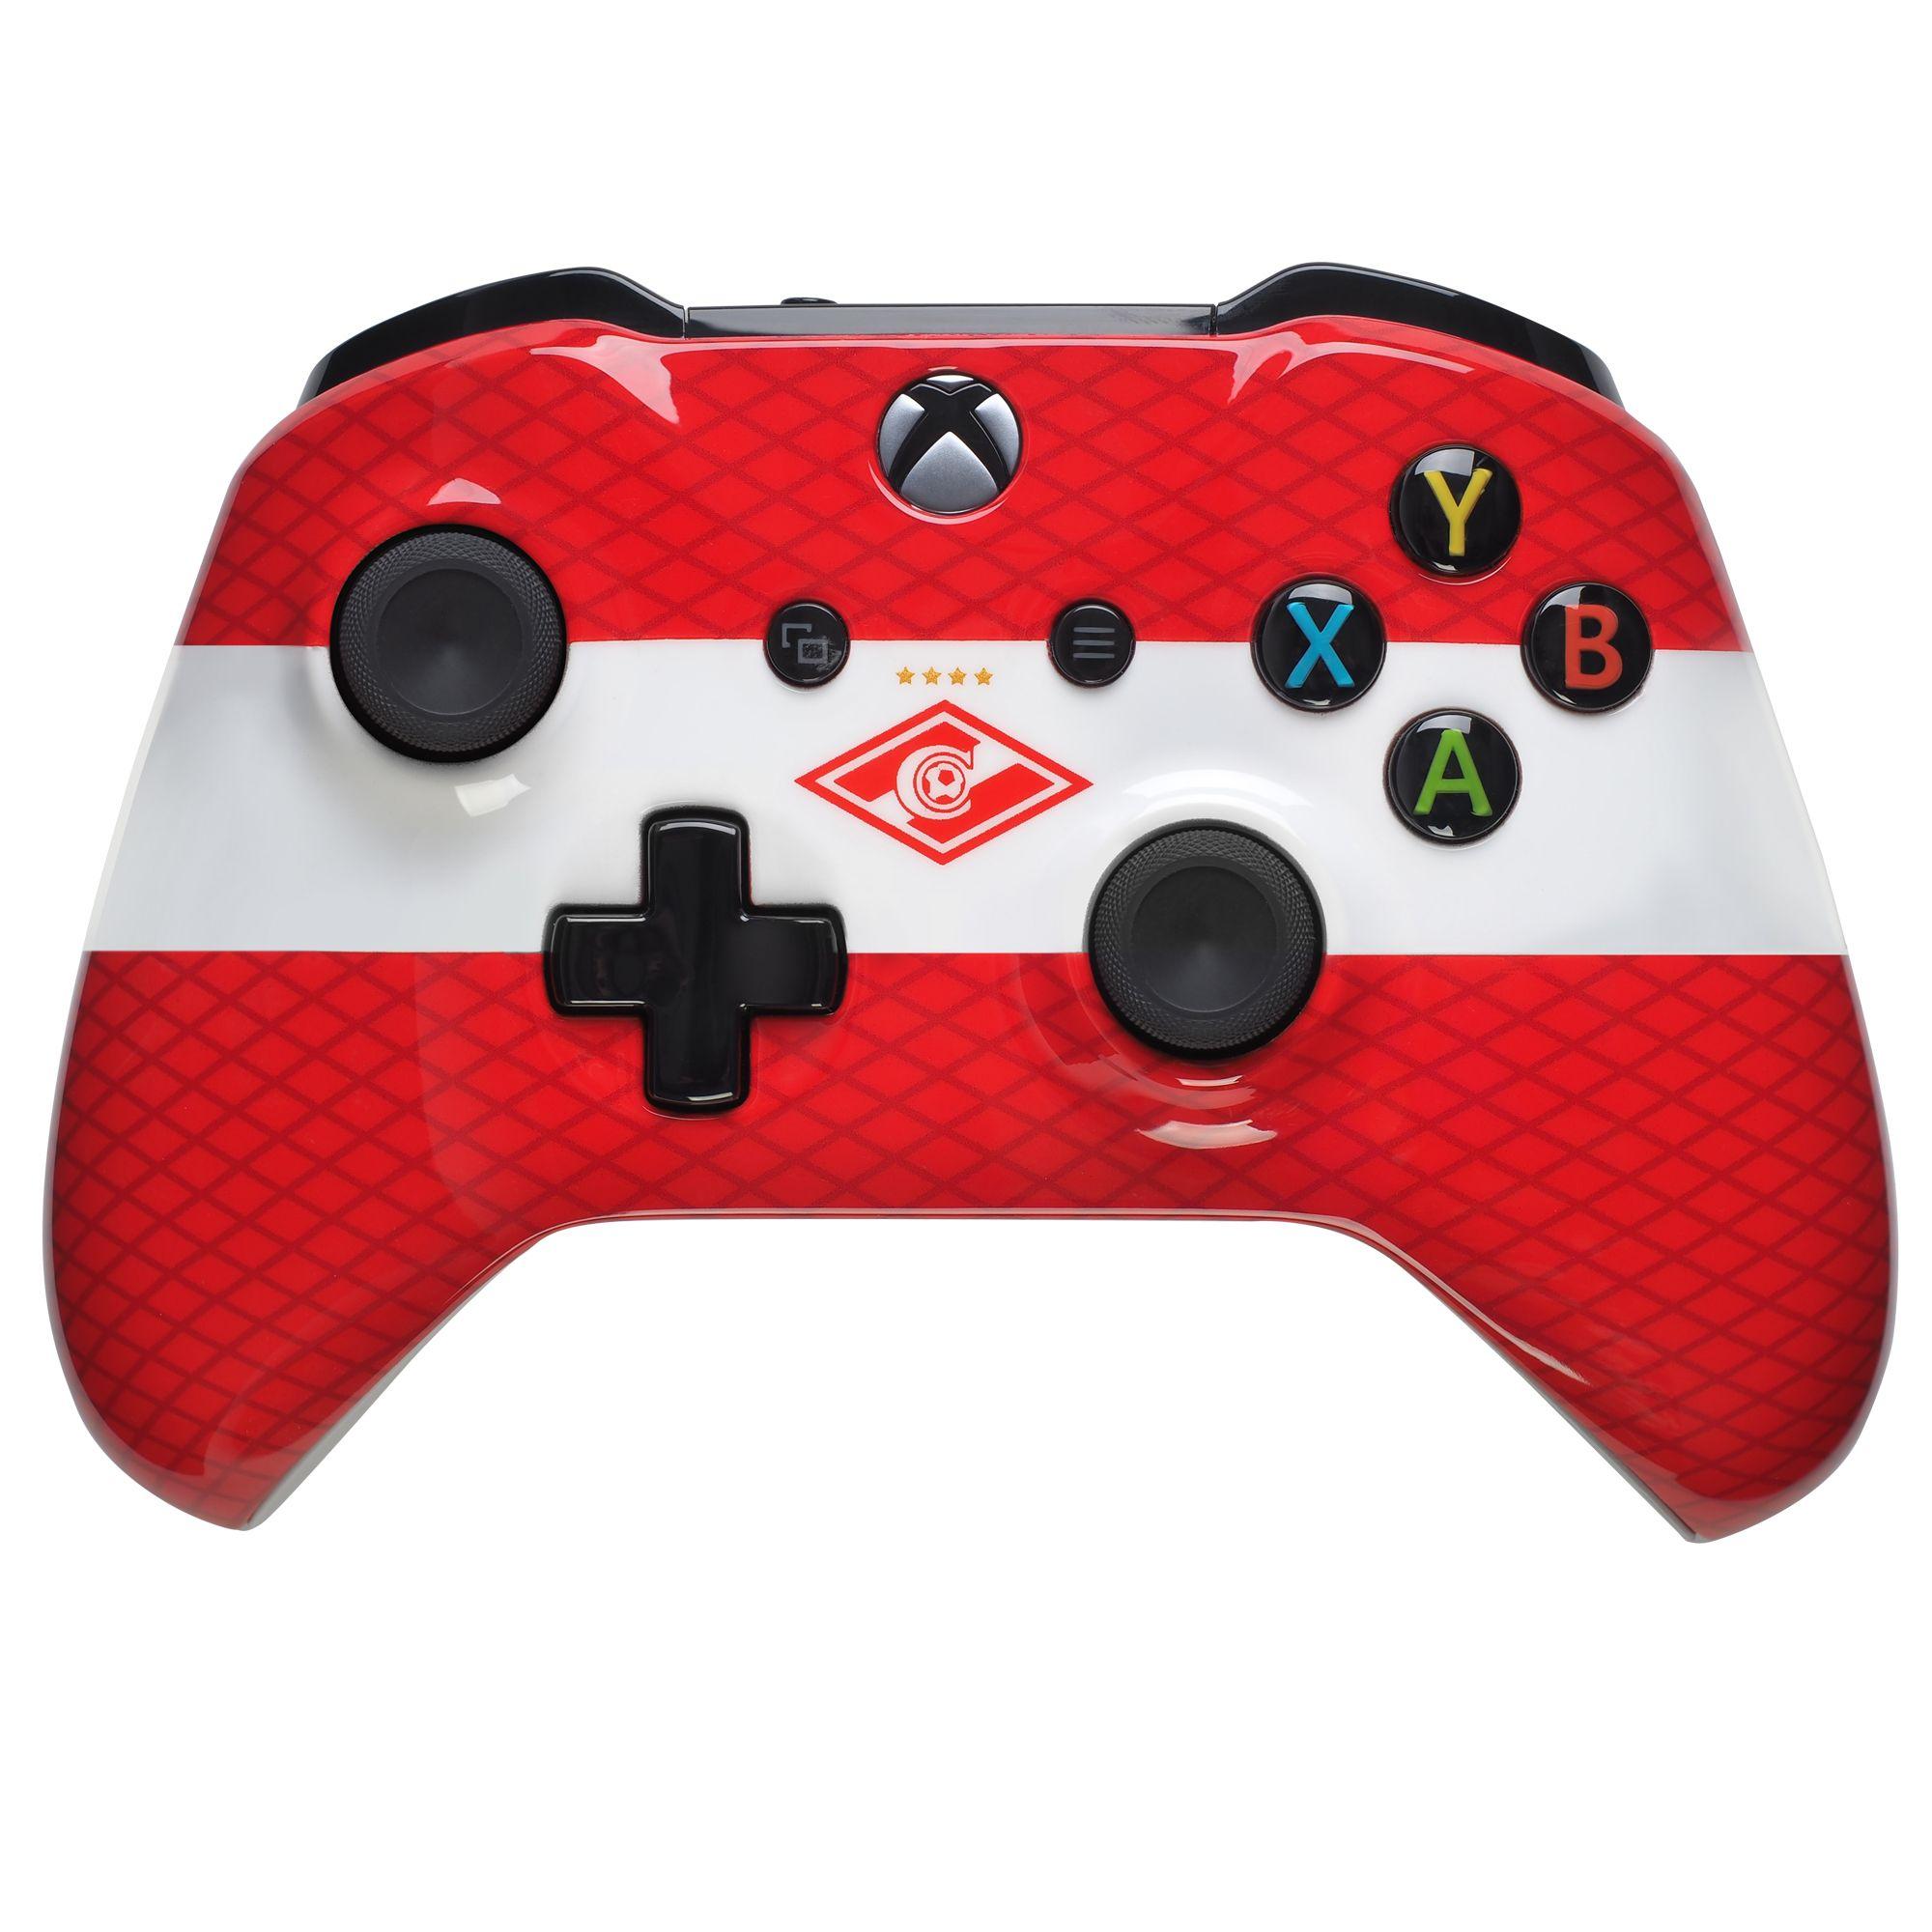 Кастомизированный контроллер Xbox One «Красно-Белый» (XboxOne)